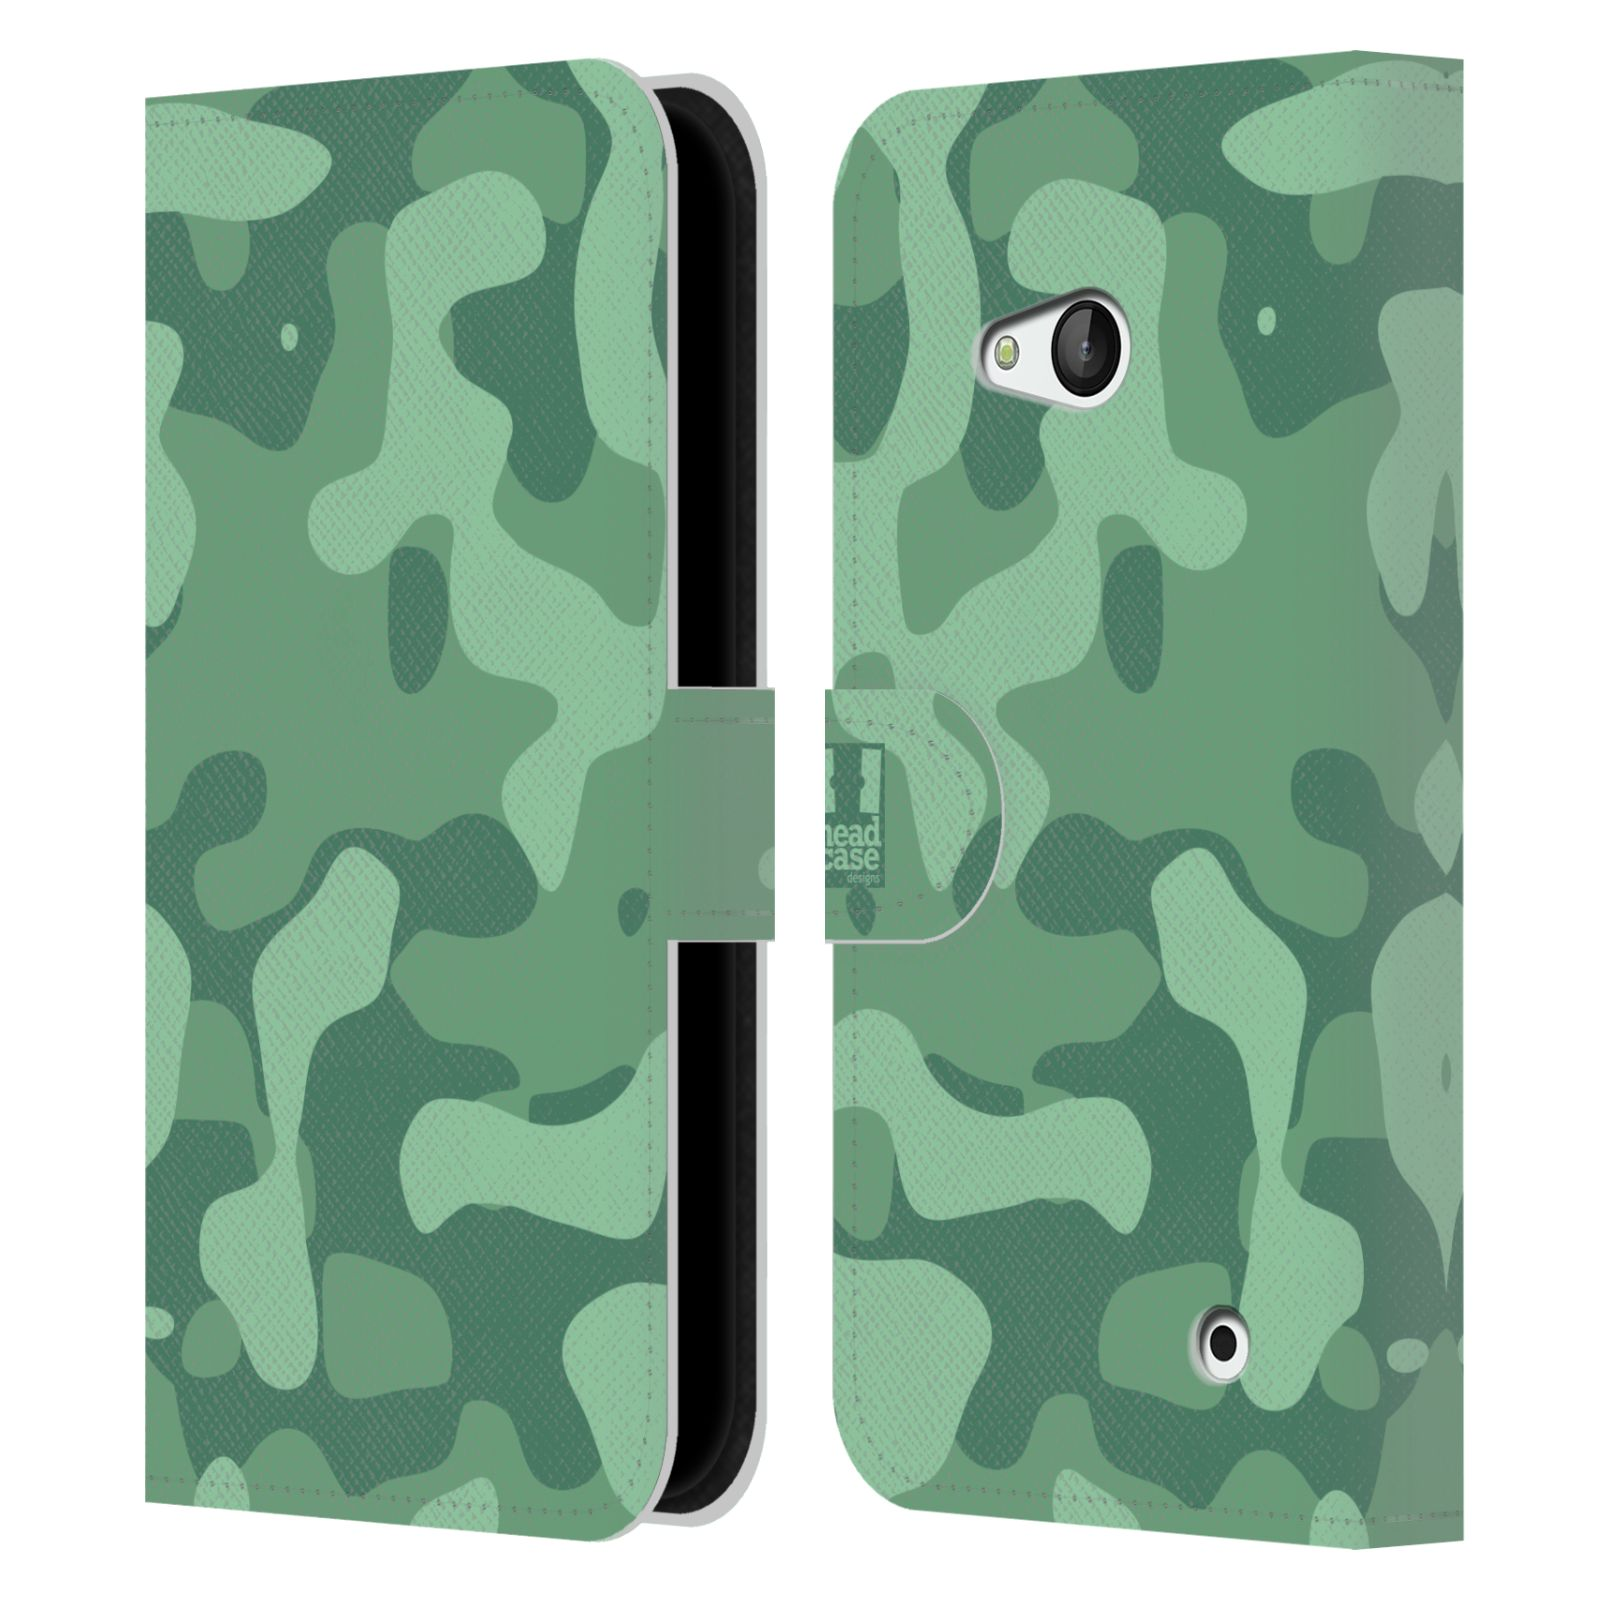 HEAD CASE Flipové pouzdro pro mobil NOKIA / MICROSOFT LUMIA 640 / LUMIA 640 DUAL lehká barevná kamufláž mentol zelená